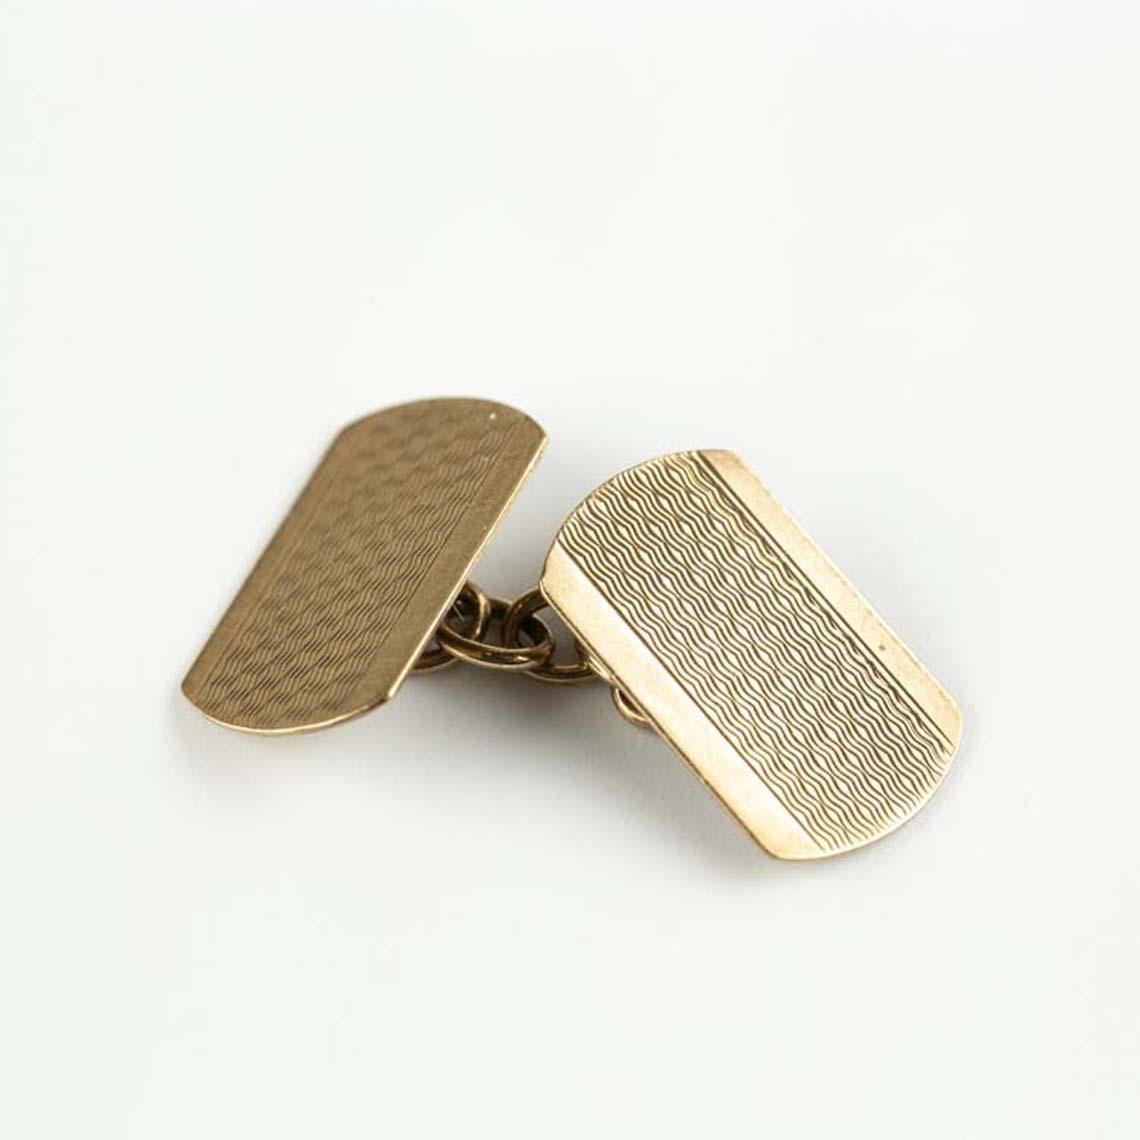 9ct yellow gold cufflinks